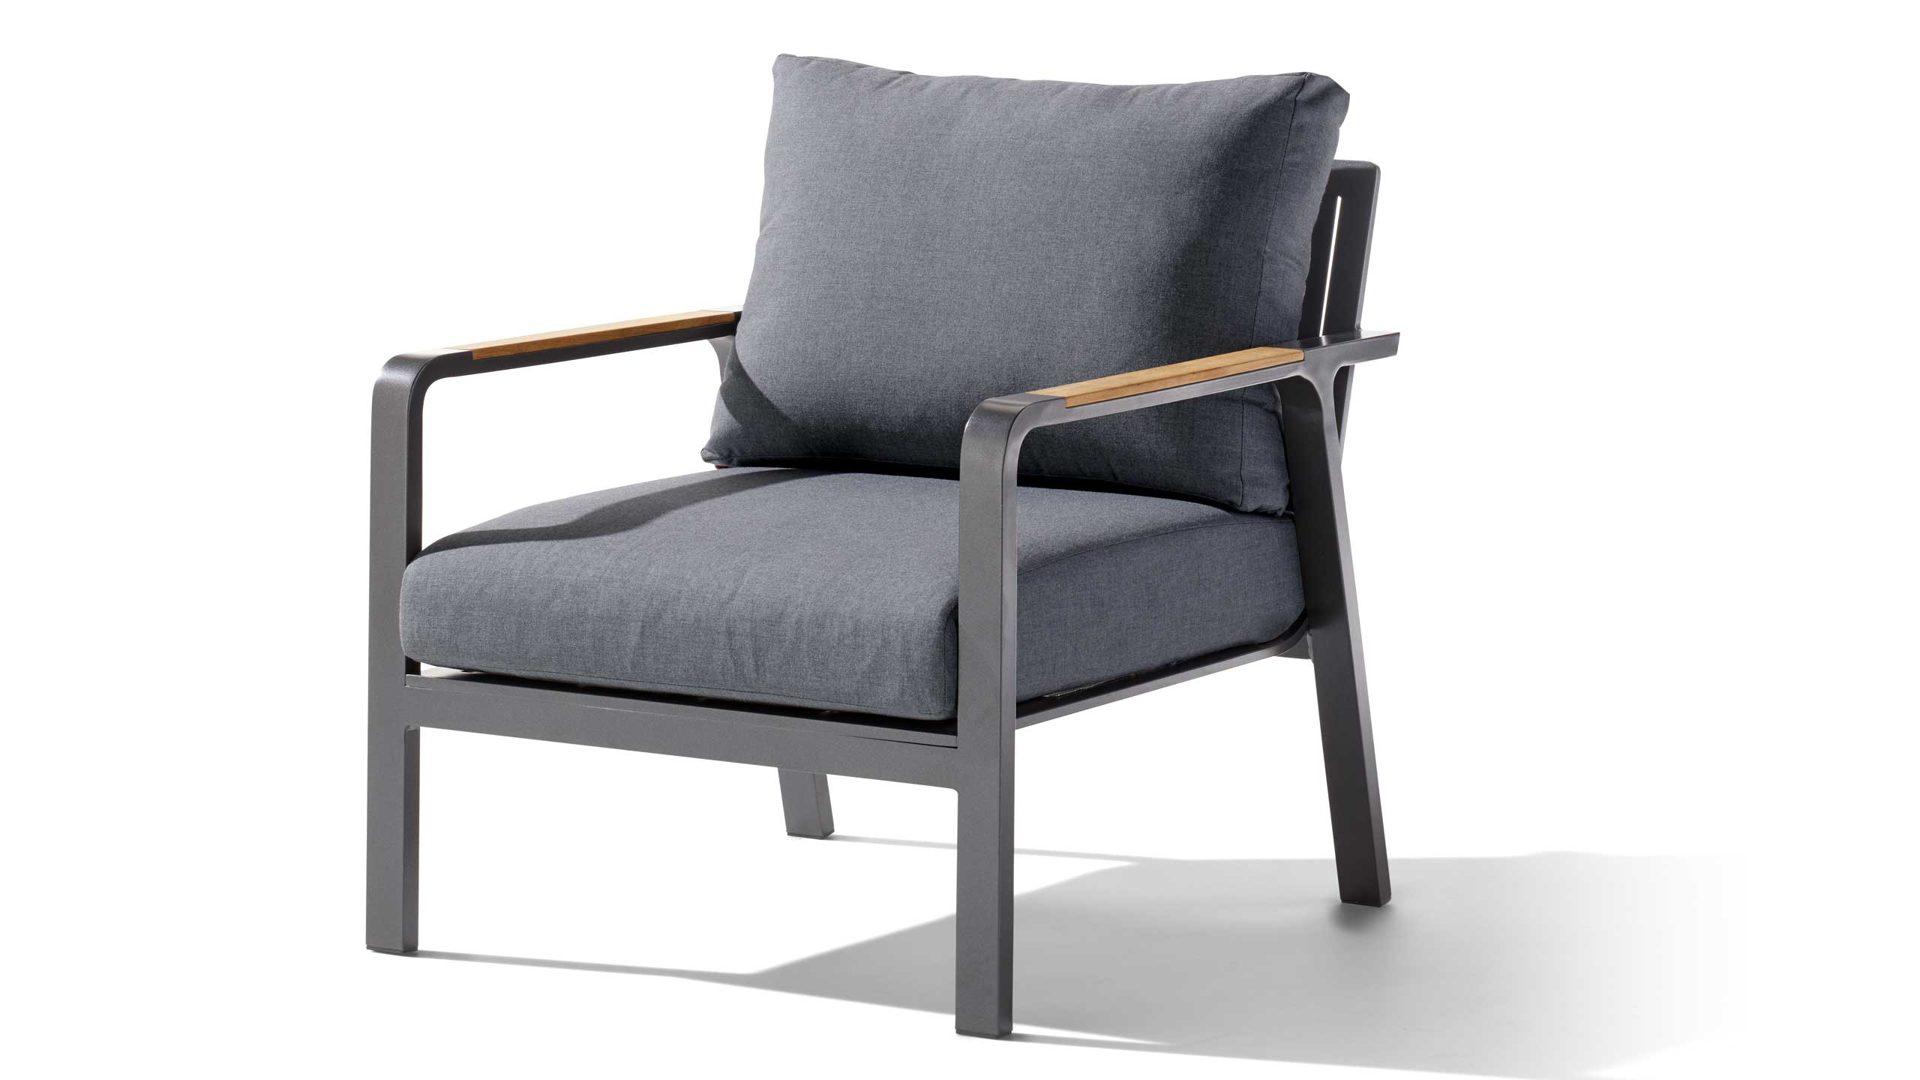 Sieger Exclusiv Sessel 1-Sitzer Nassau 431 G-G, Gestell Aluminium ...